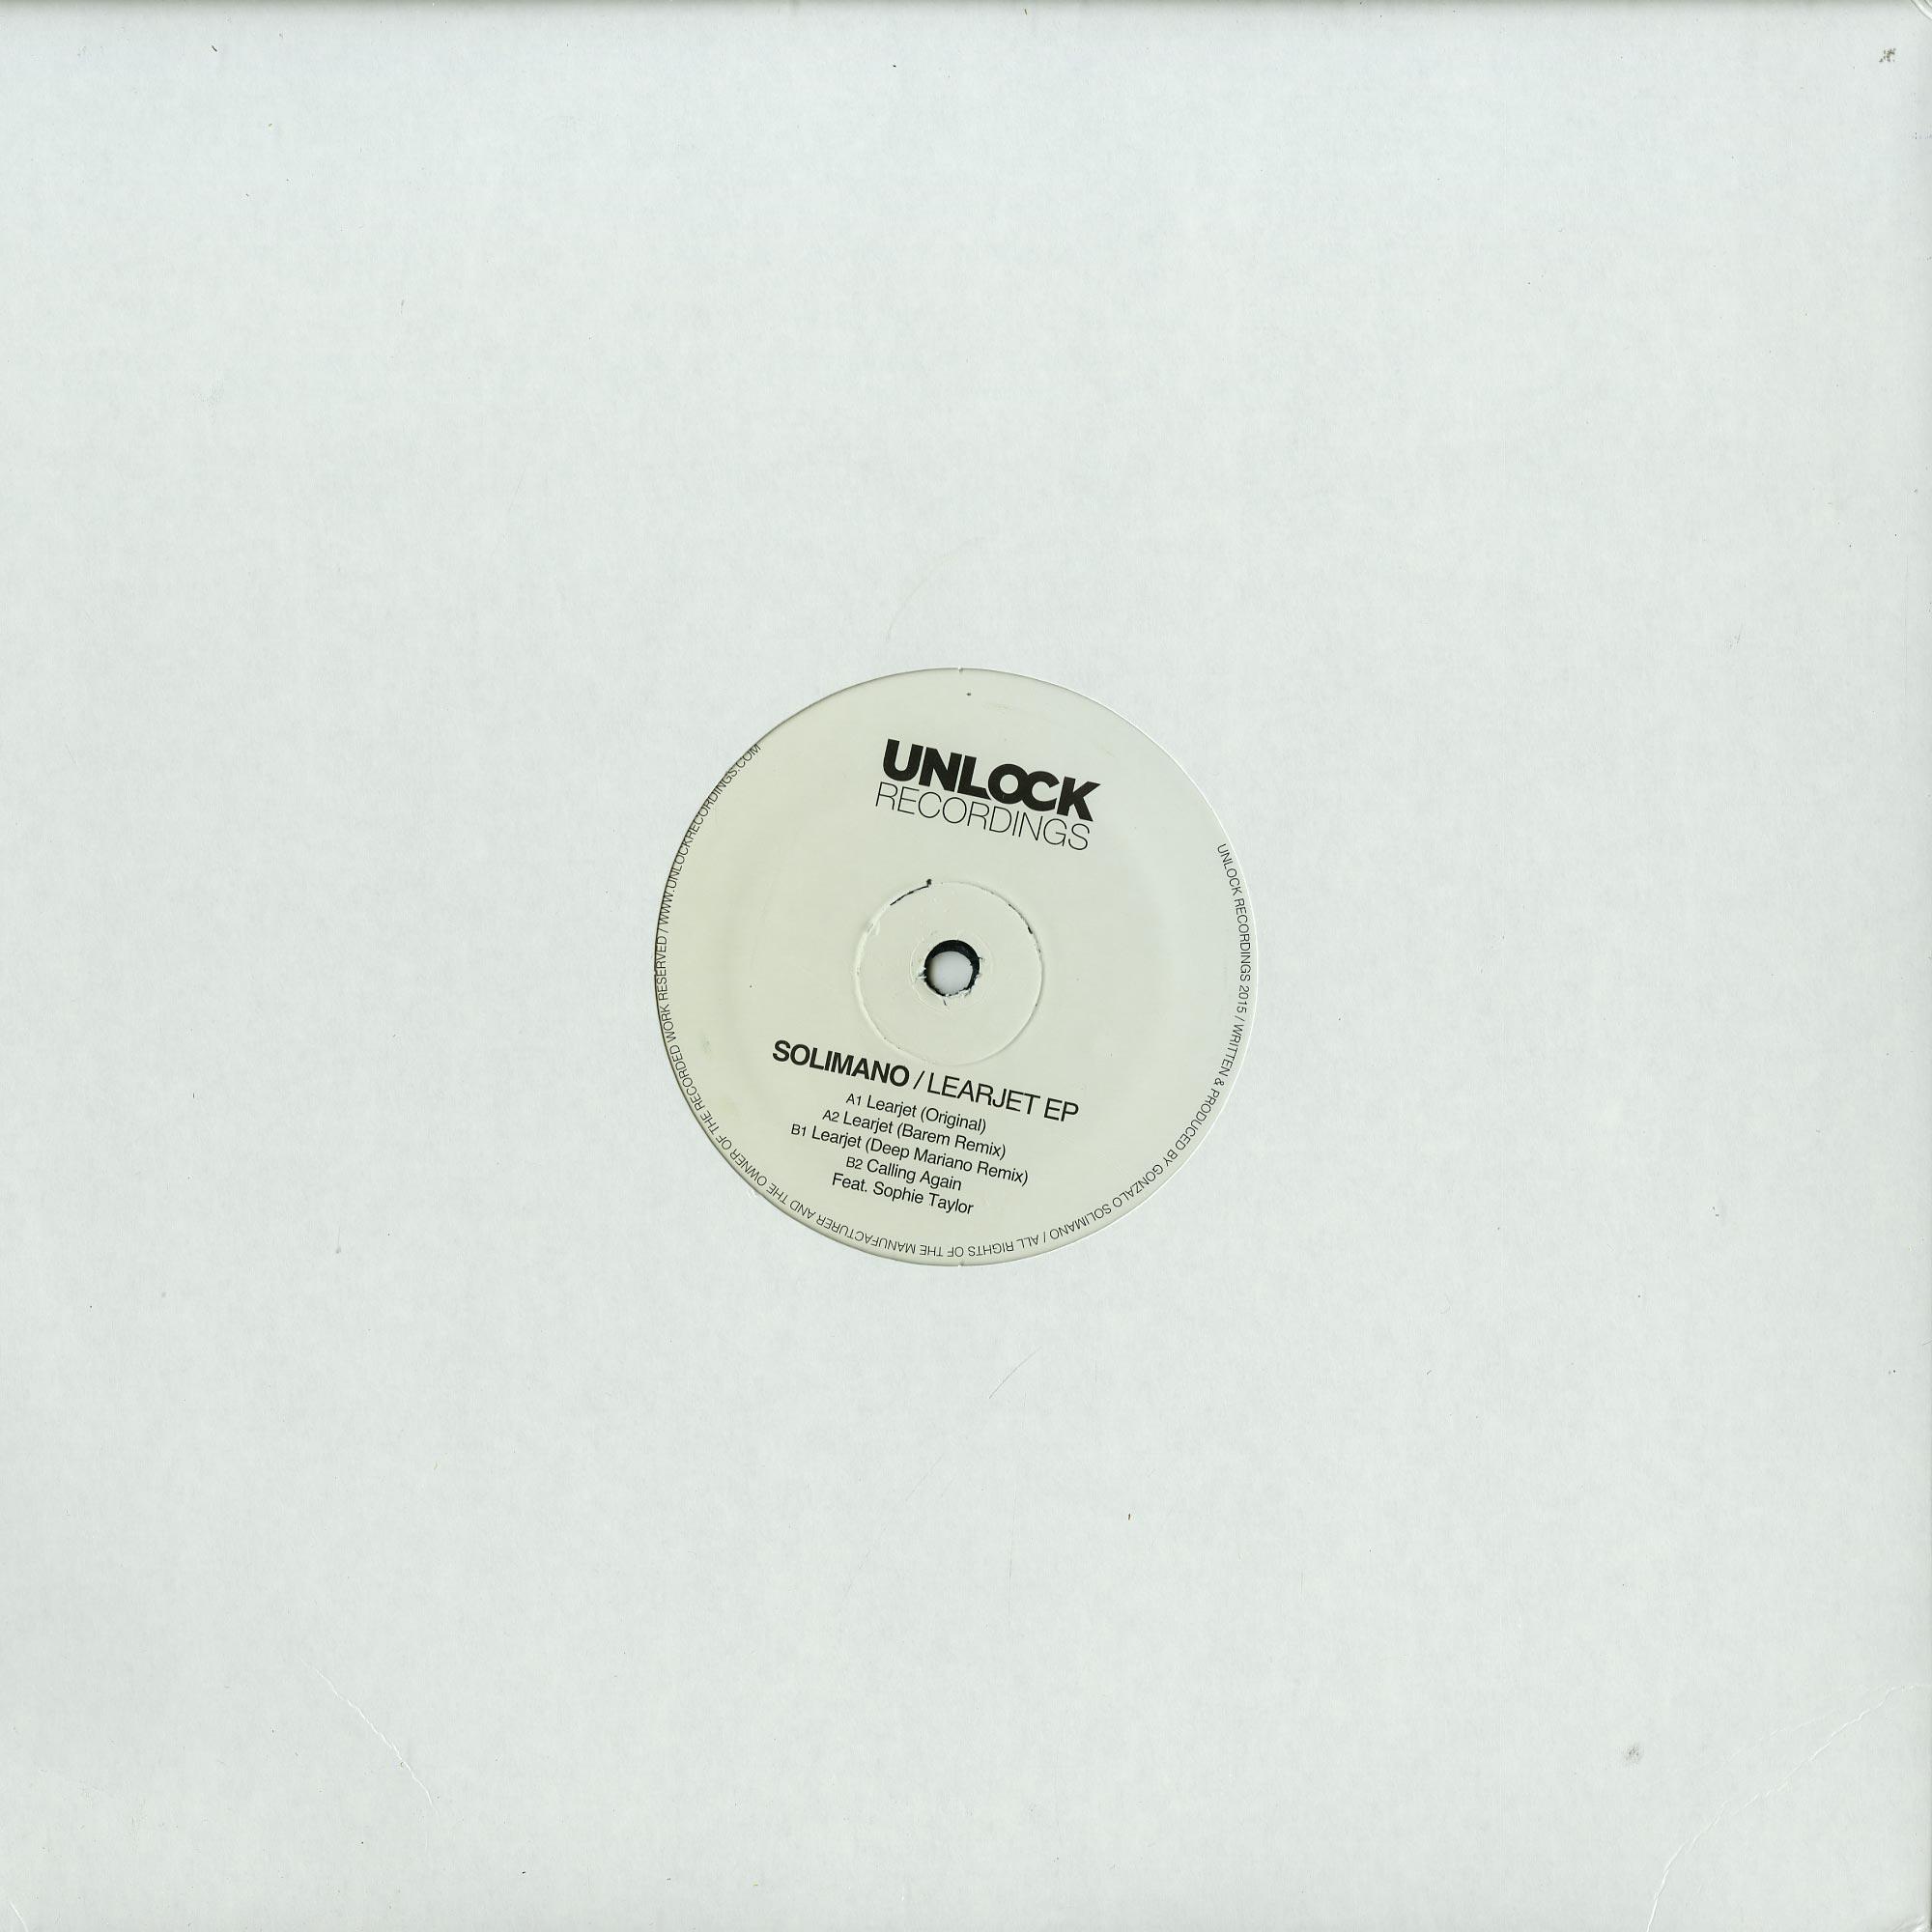 Solimano - LEARJET EP